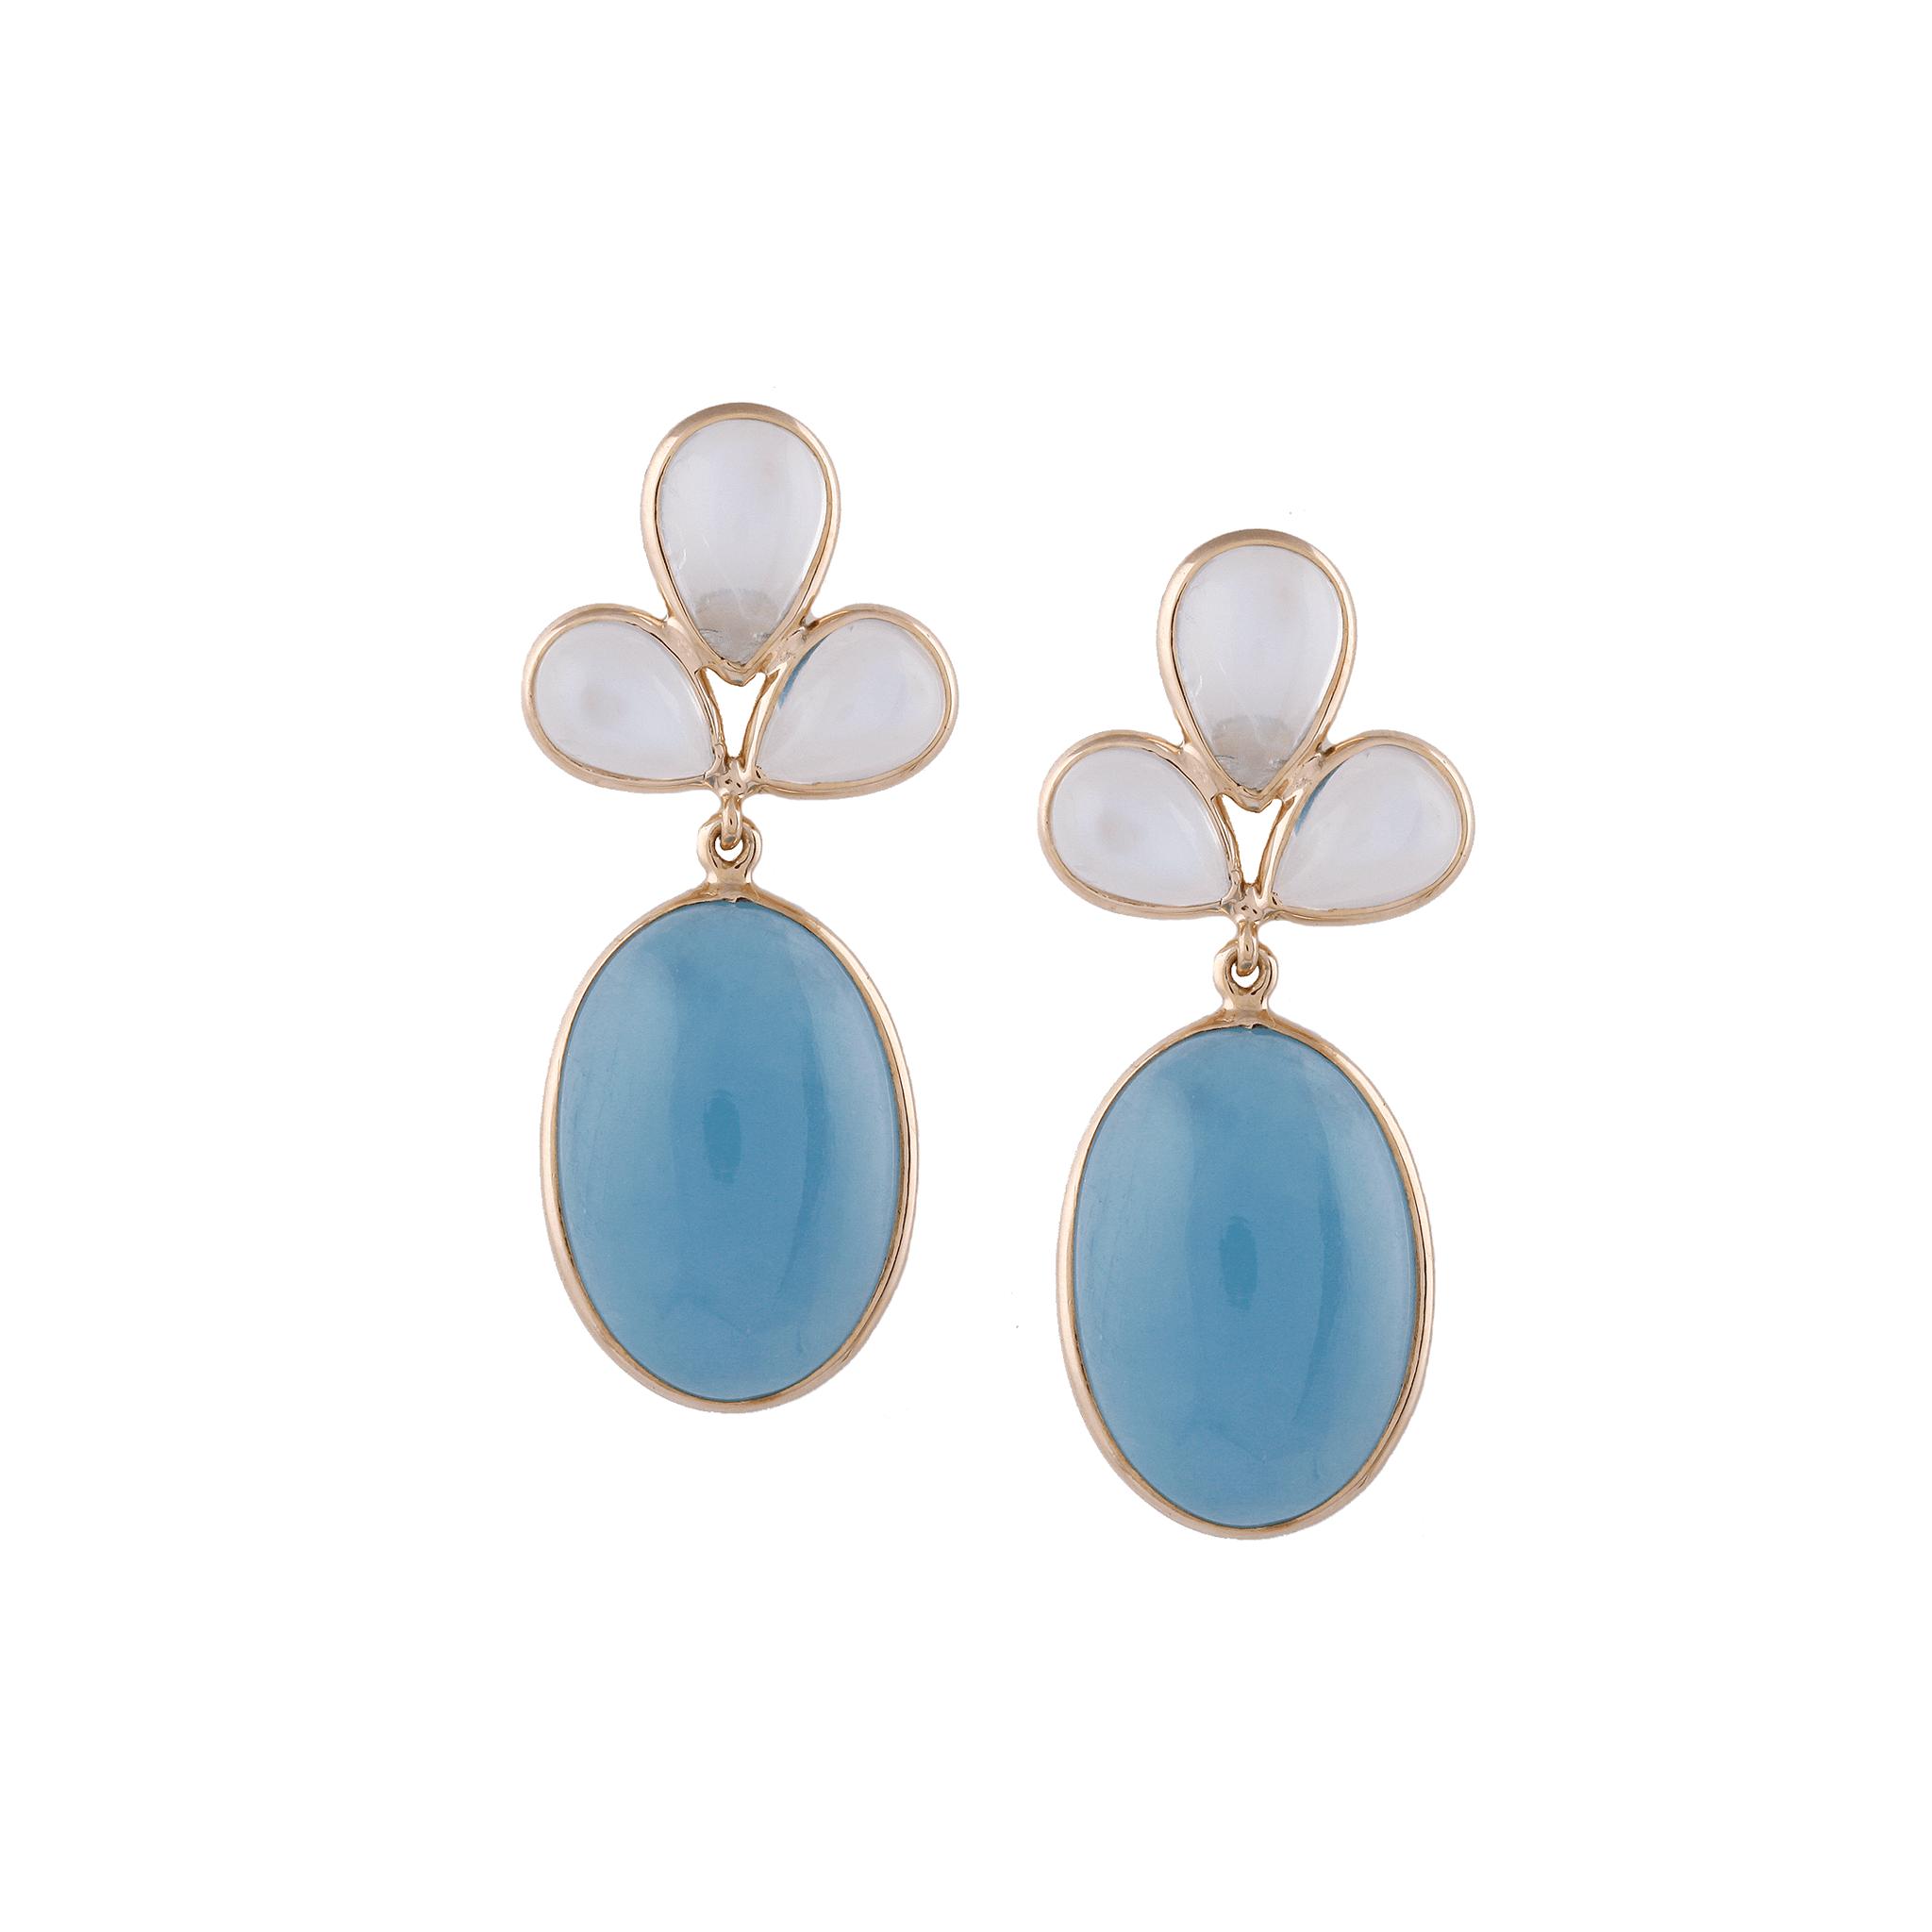 Tresor Collection - Rainbow Moonstone & Aquamarine Oval Earrings in 18K YG